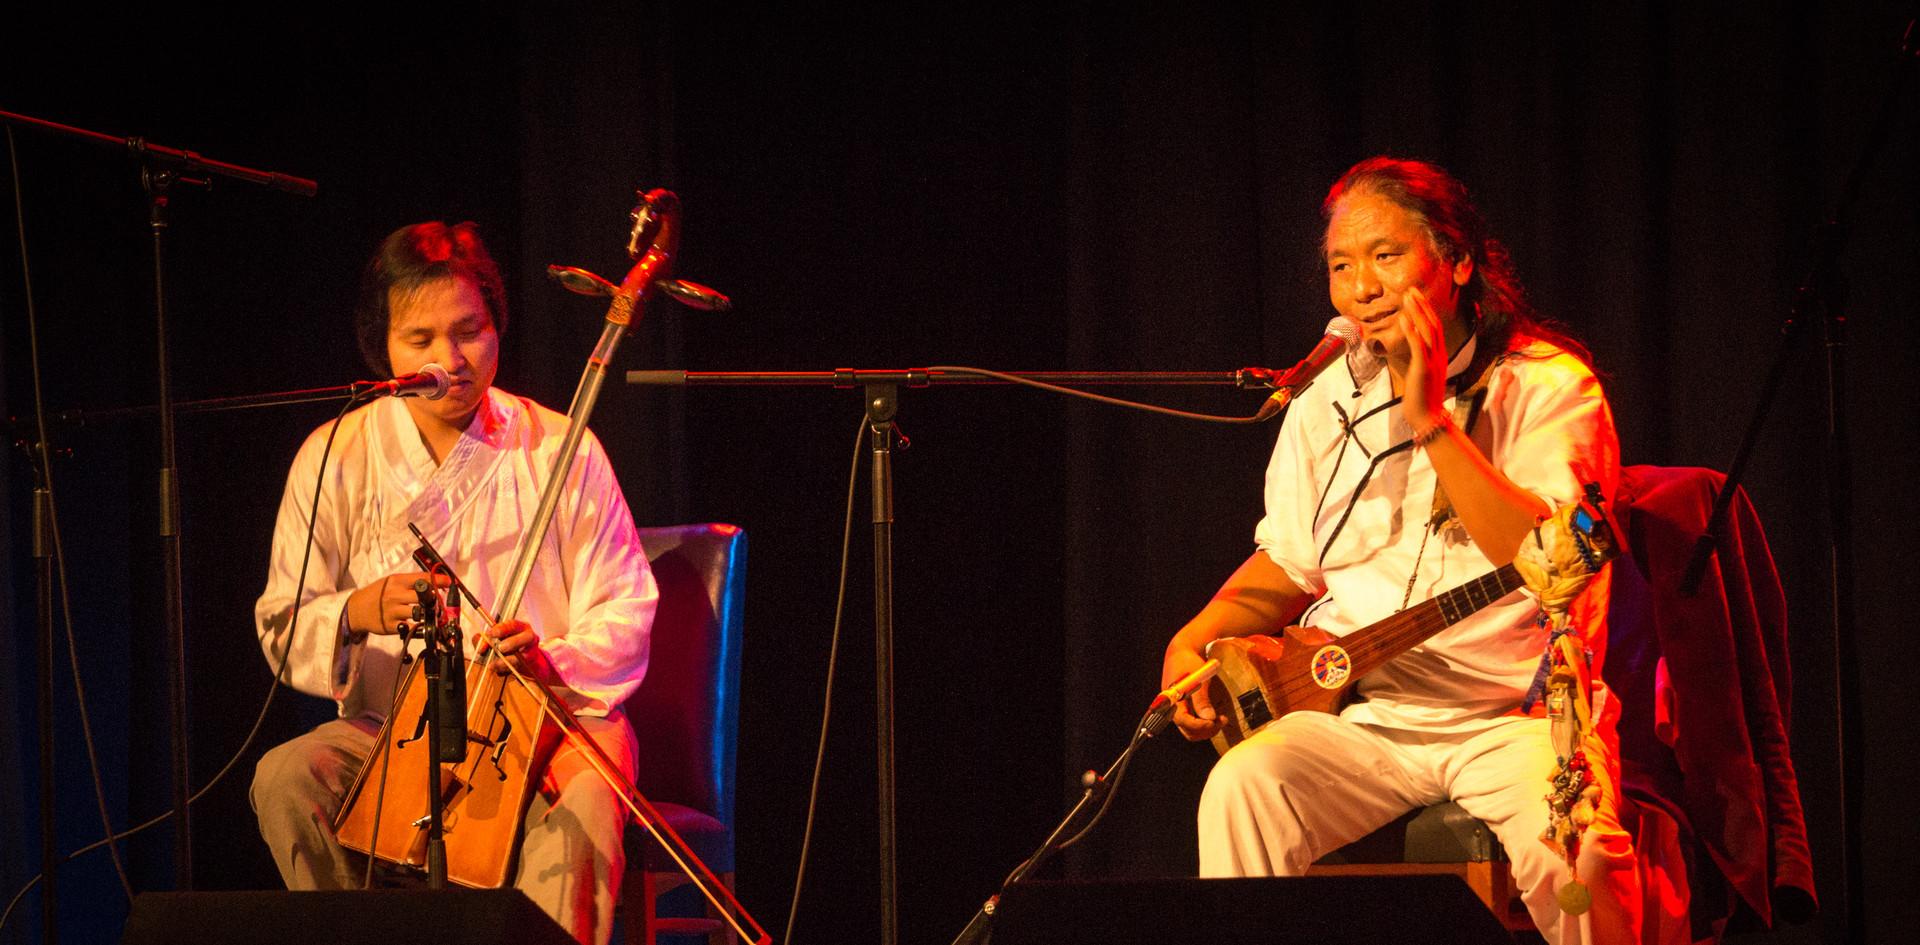 Bukhchuluun Ganburged and Tenzin Choegya